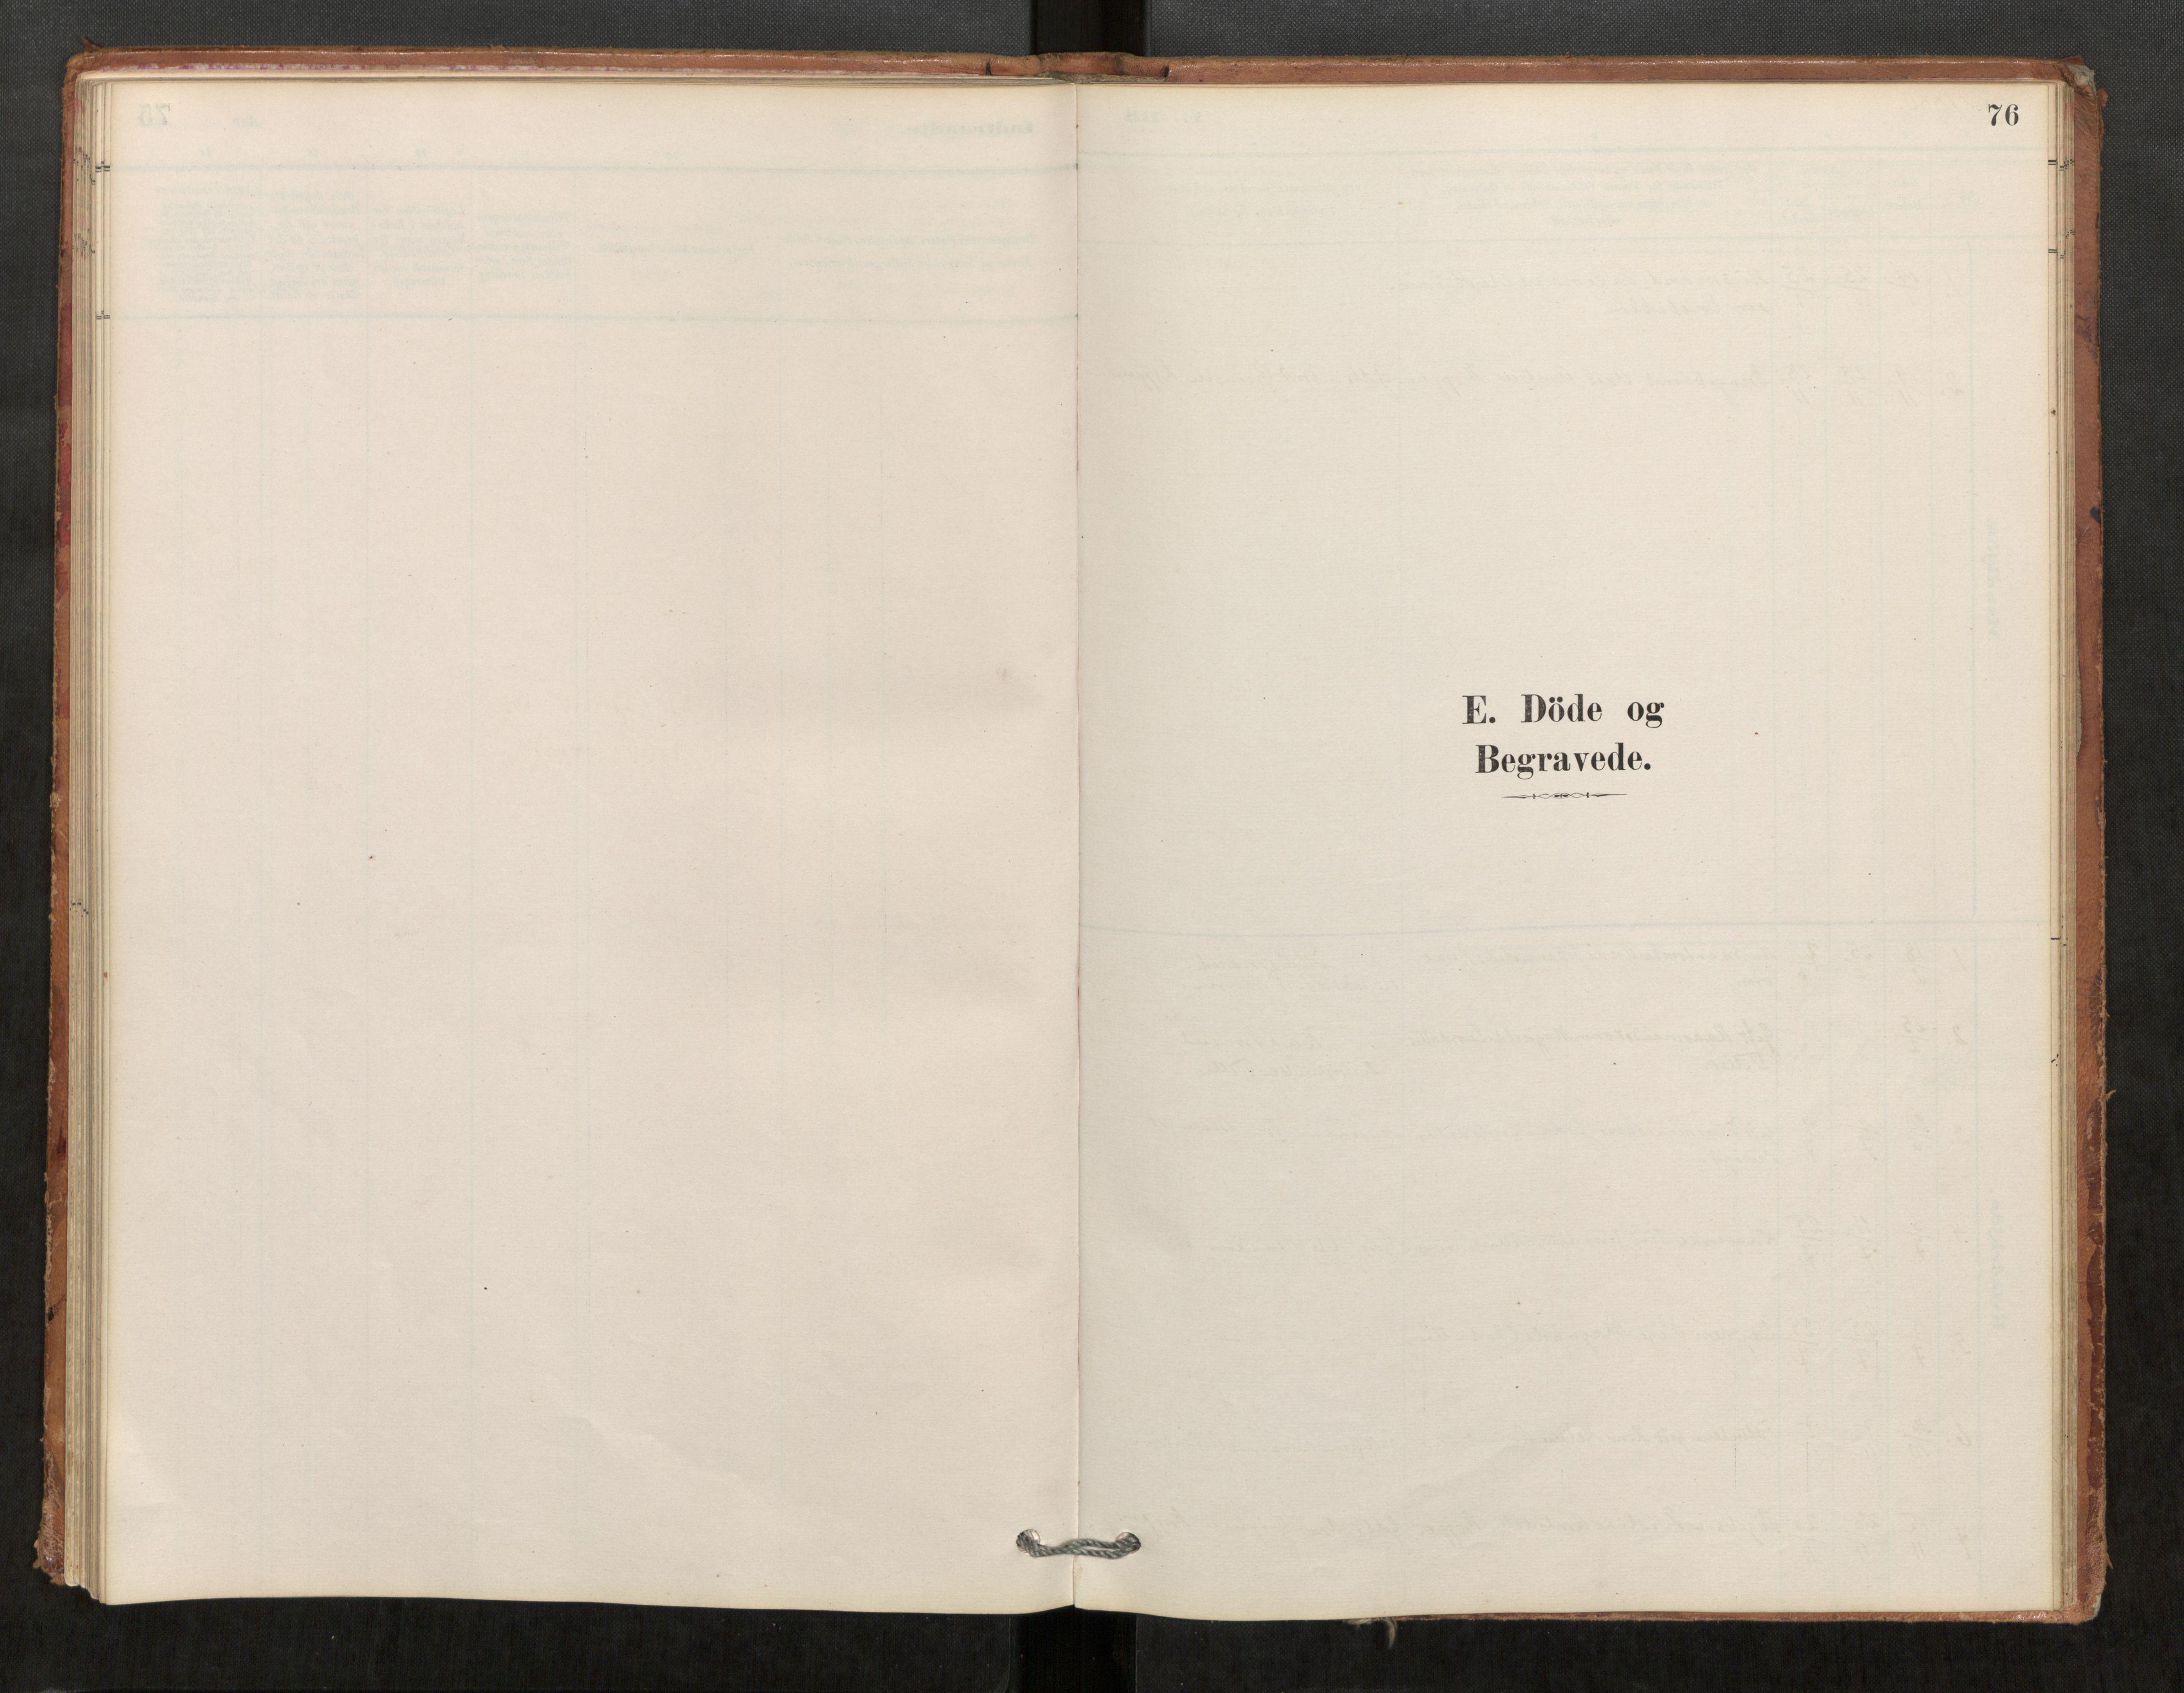 SAT, Klæbu sokneprestkontor, Ministerialbok nr. 1, 1880-1900, s. 76